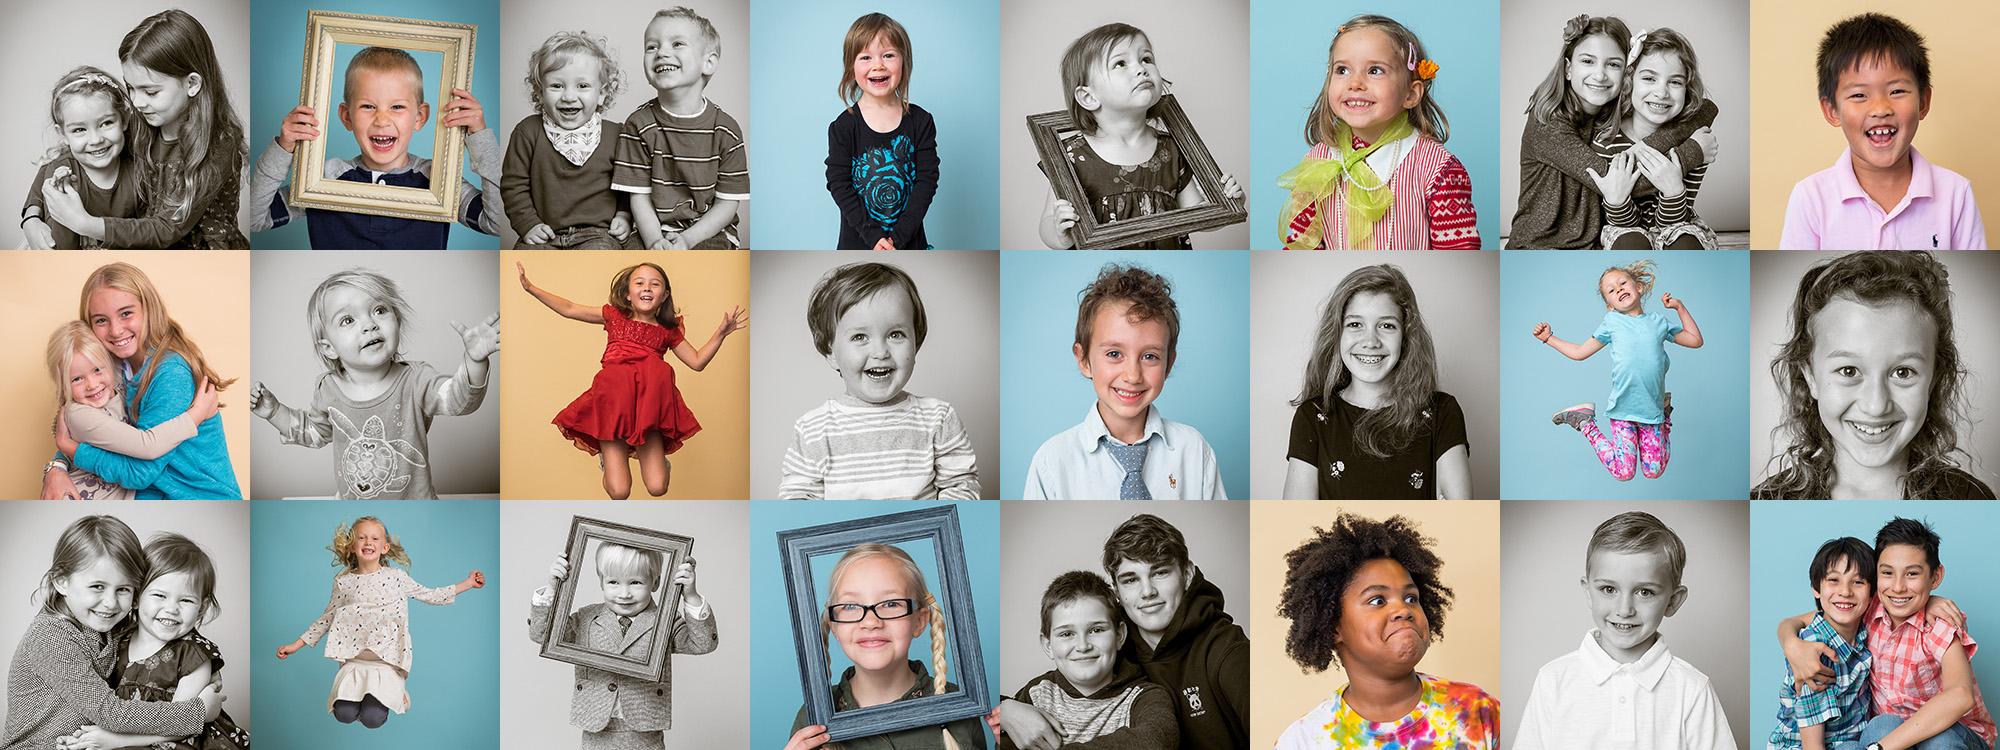 School photo collage.jpg